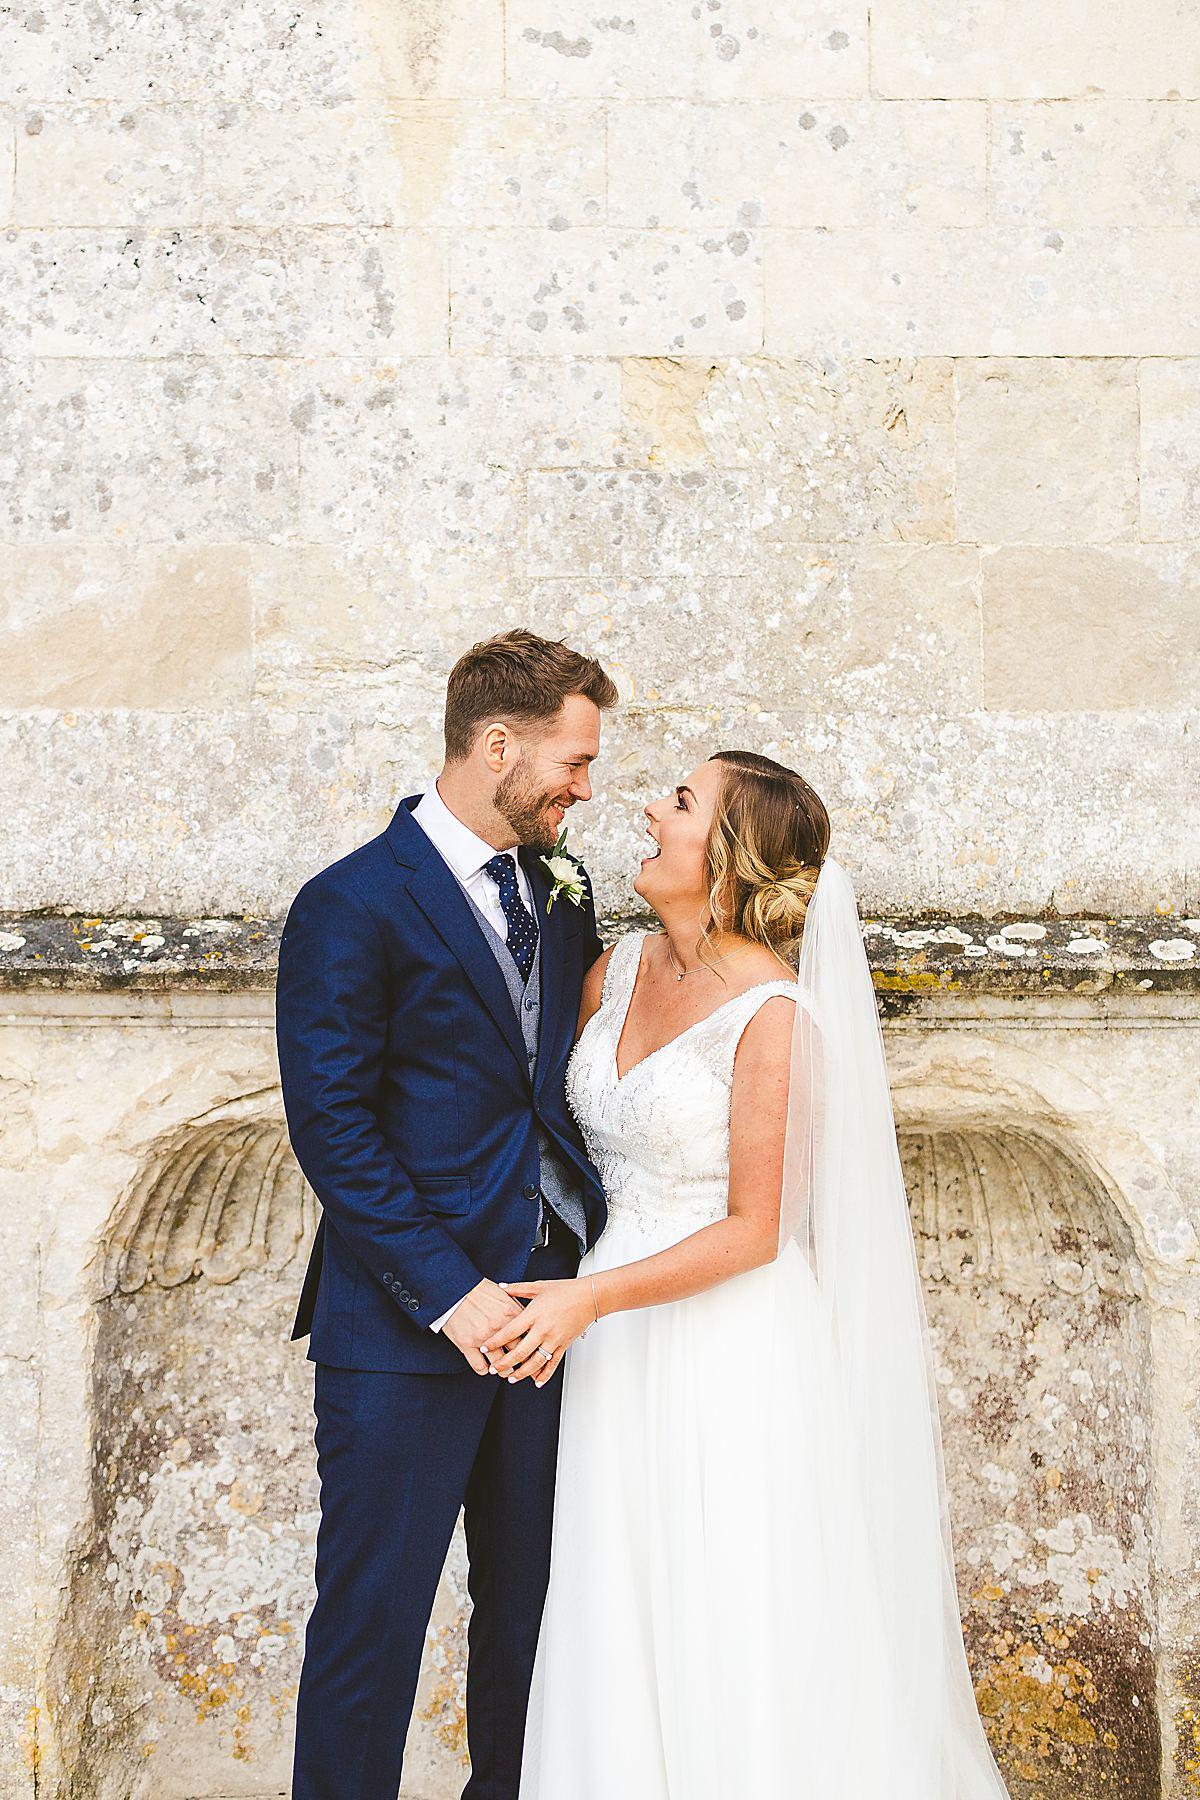 Lulworth Castle wedding portrait photography